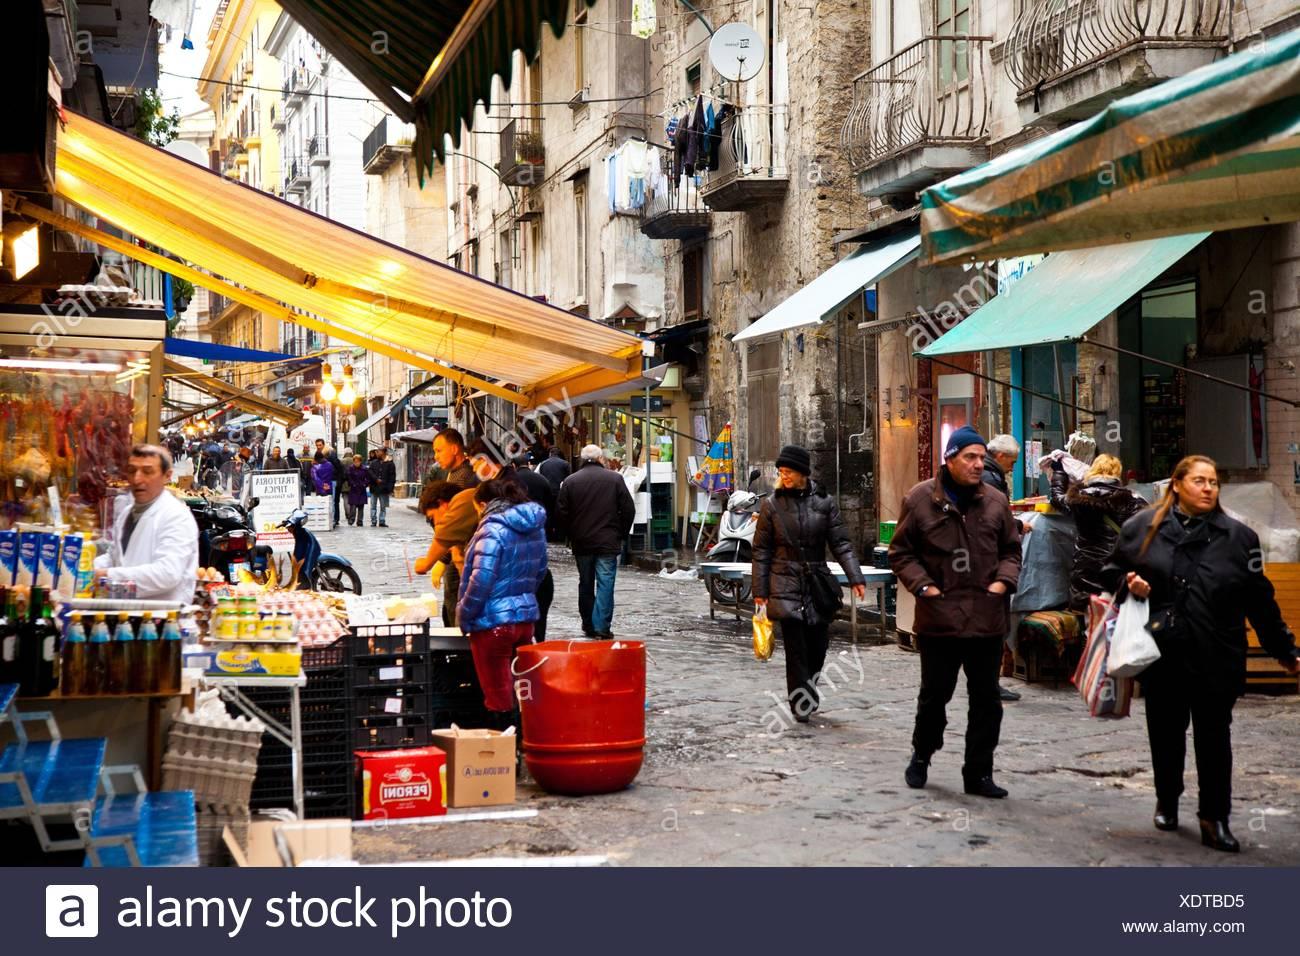 Mercato di porta nolana stockfotos mercato di porta - Mercato di porta nolana ...